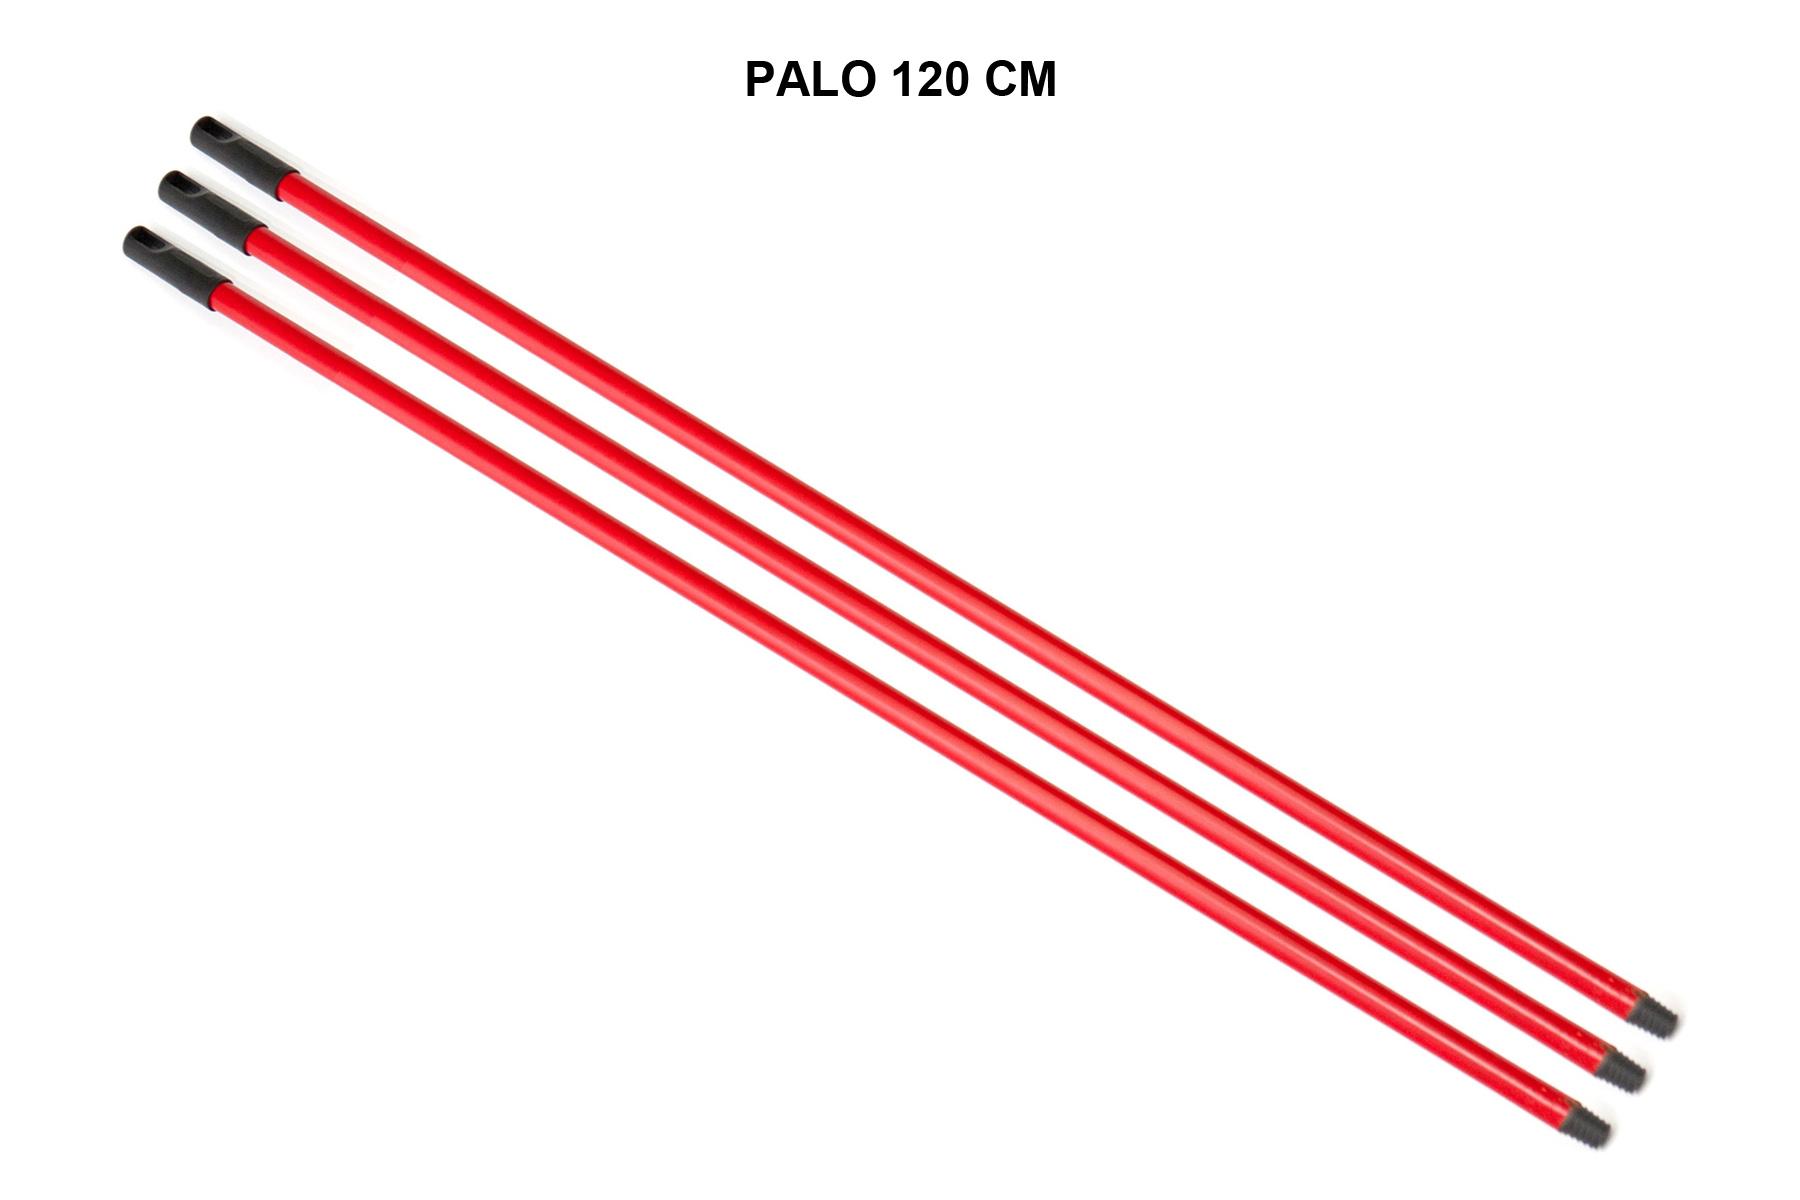 PALO 120 CM